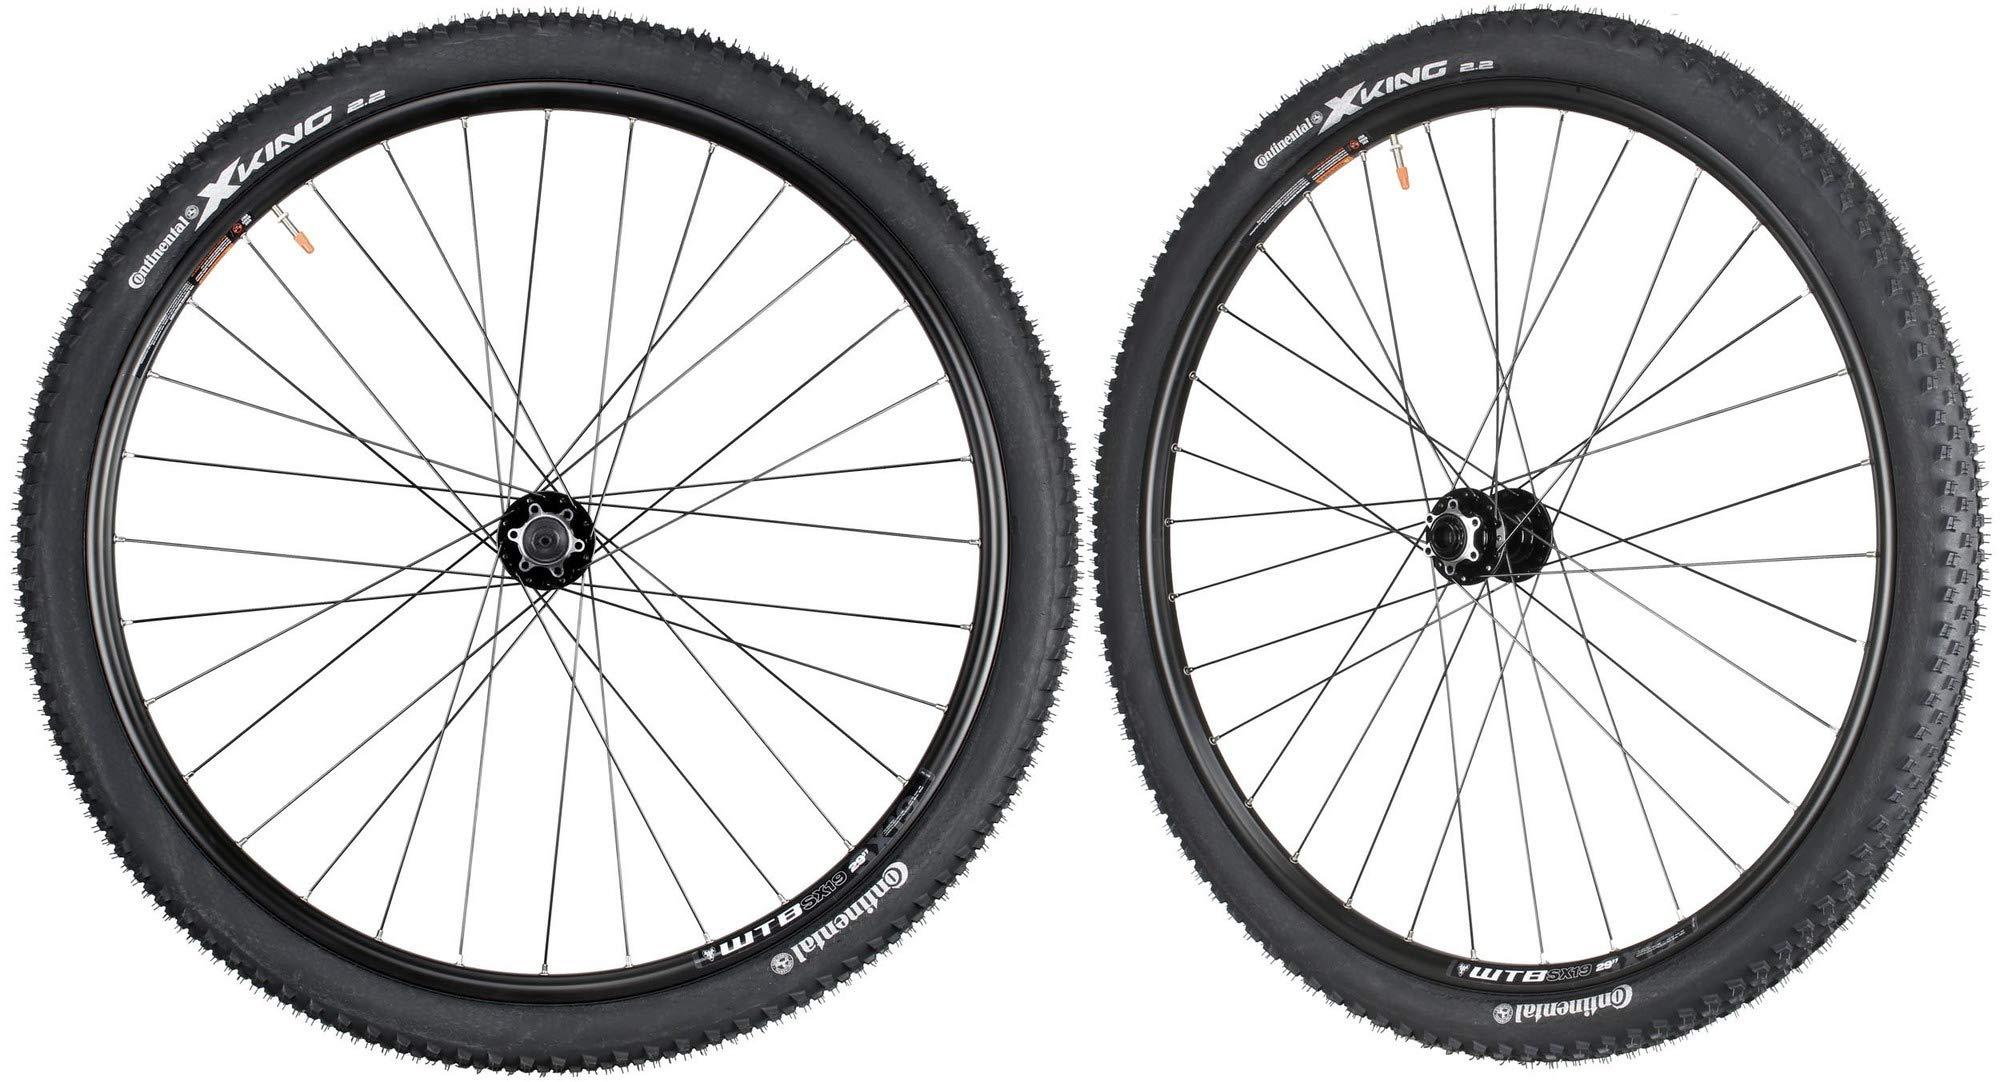 WTB SX19 Mountain Bike Wheelset 29'' Continental Tires Novatec Hubs Front 15mm Rear QR